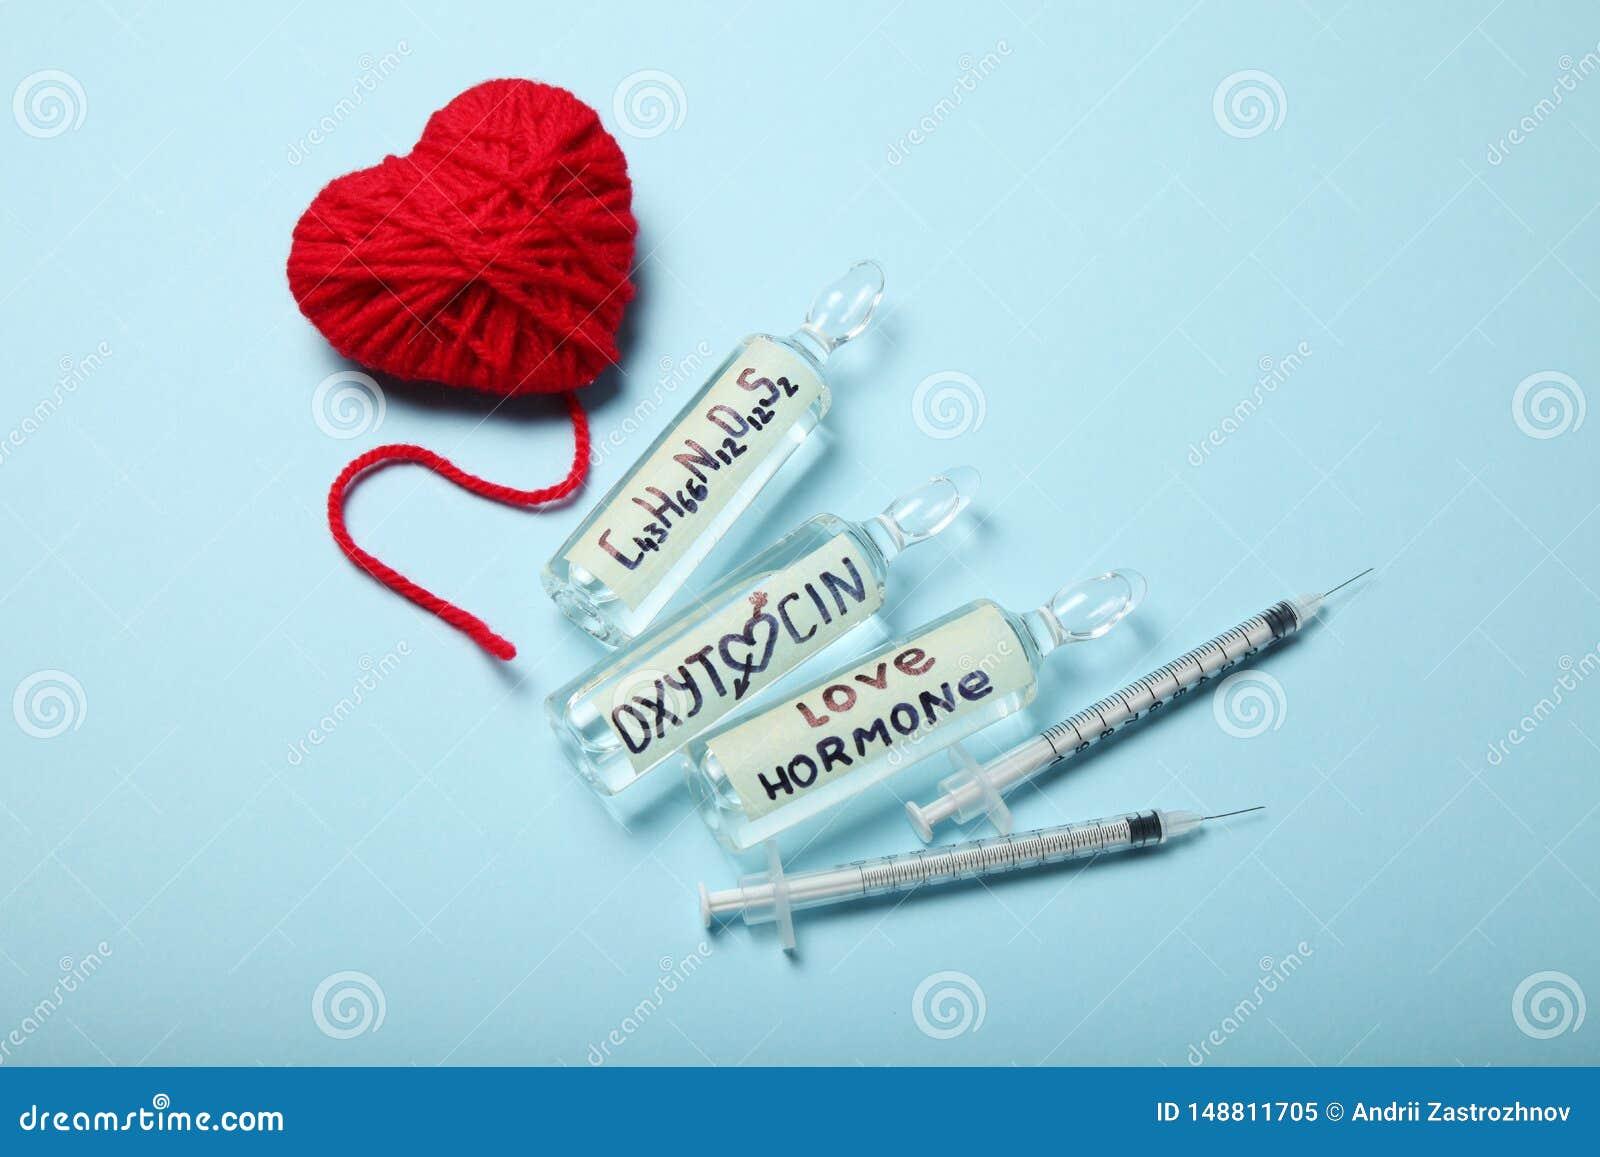 Biochemistry blood hormones, love and oxytocin